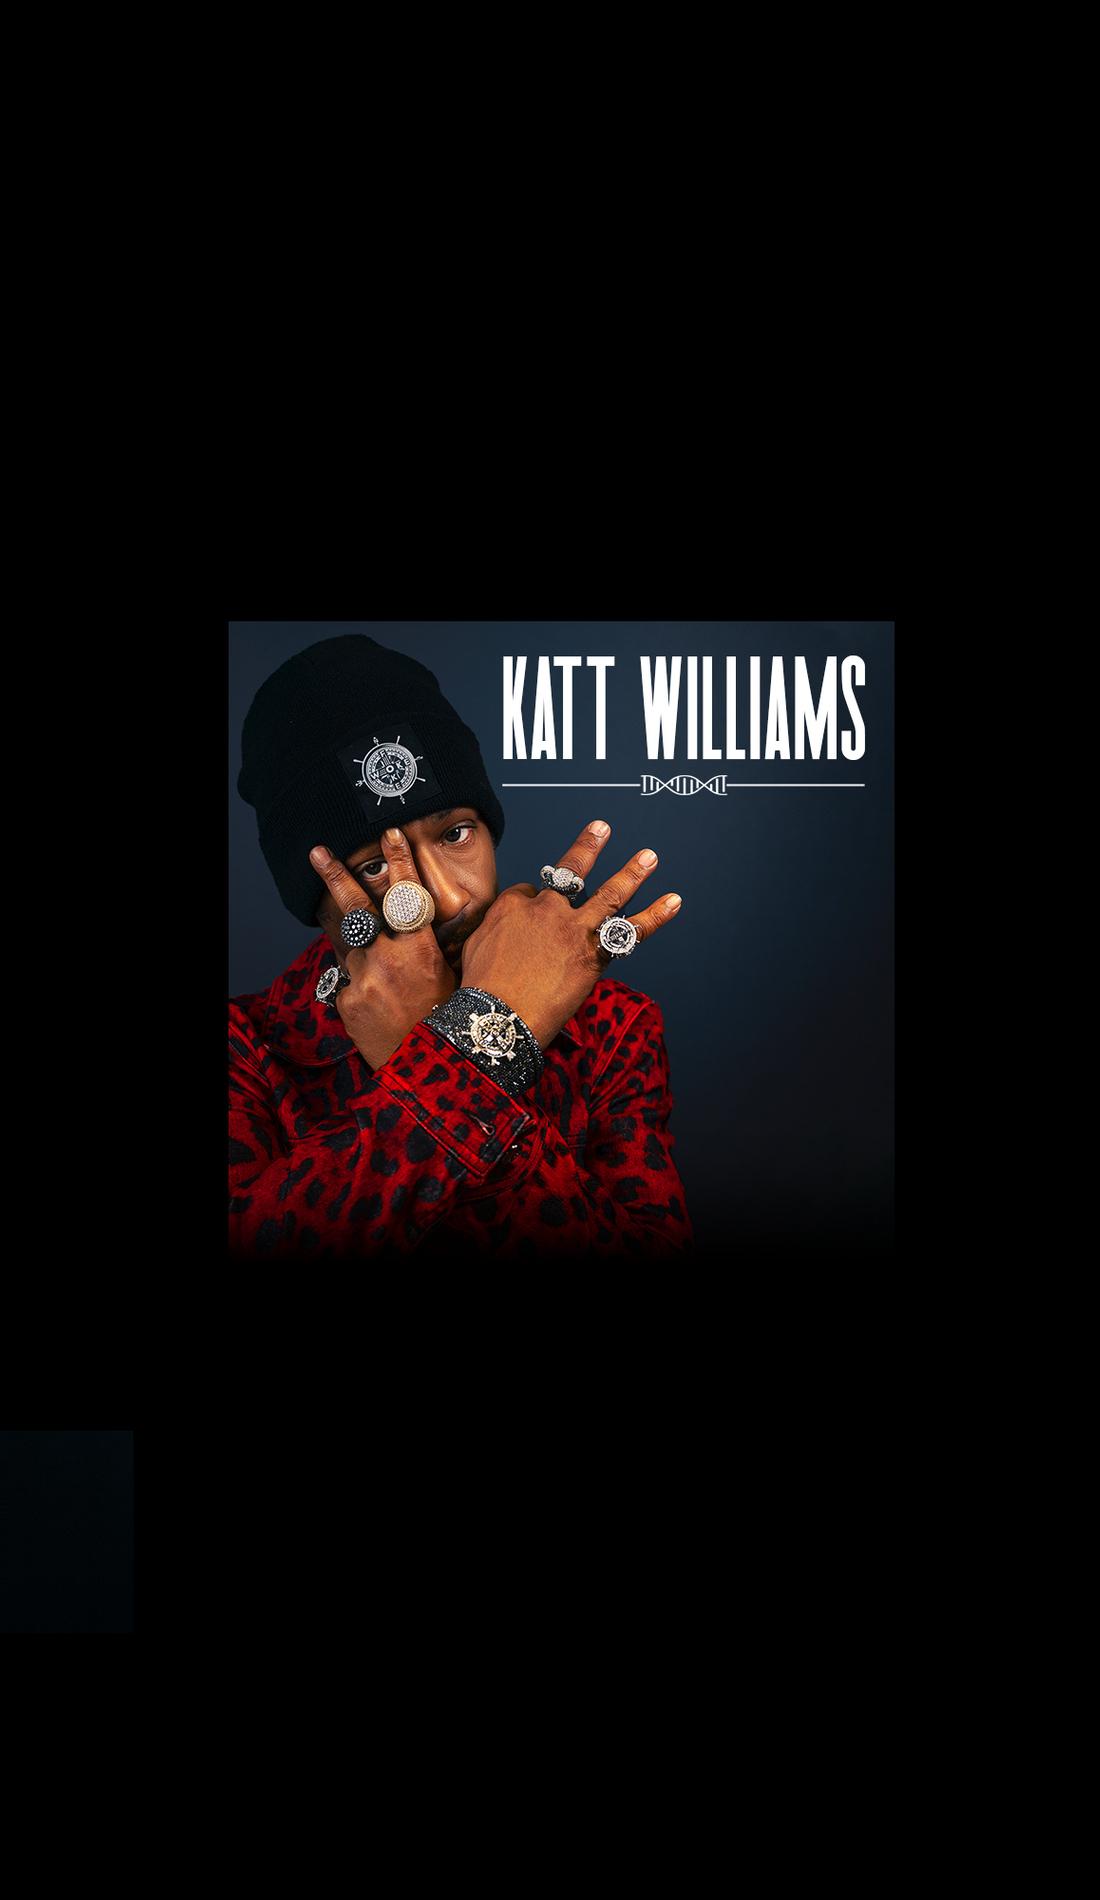 A Katt Williams live event